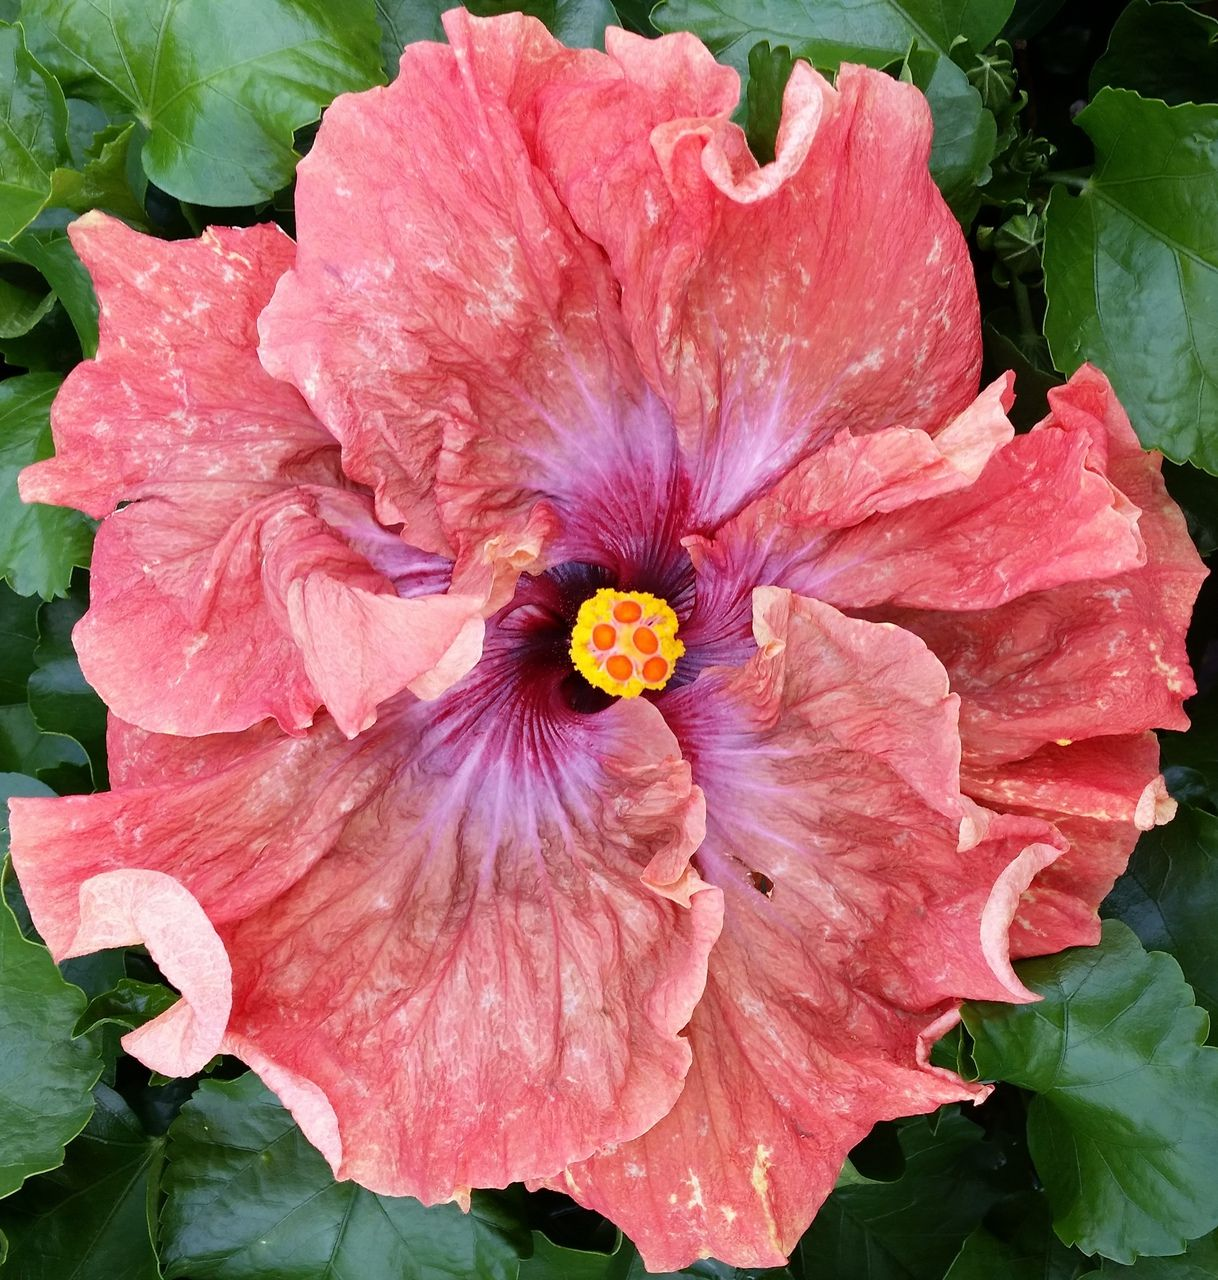 Tsunami hibiscus | Hibiscus, Flowers and Gardens